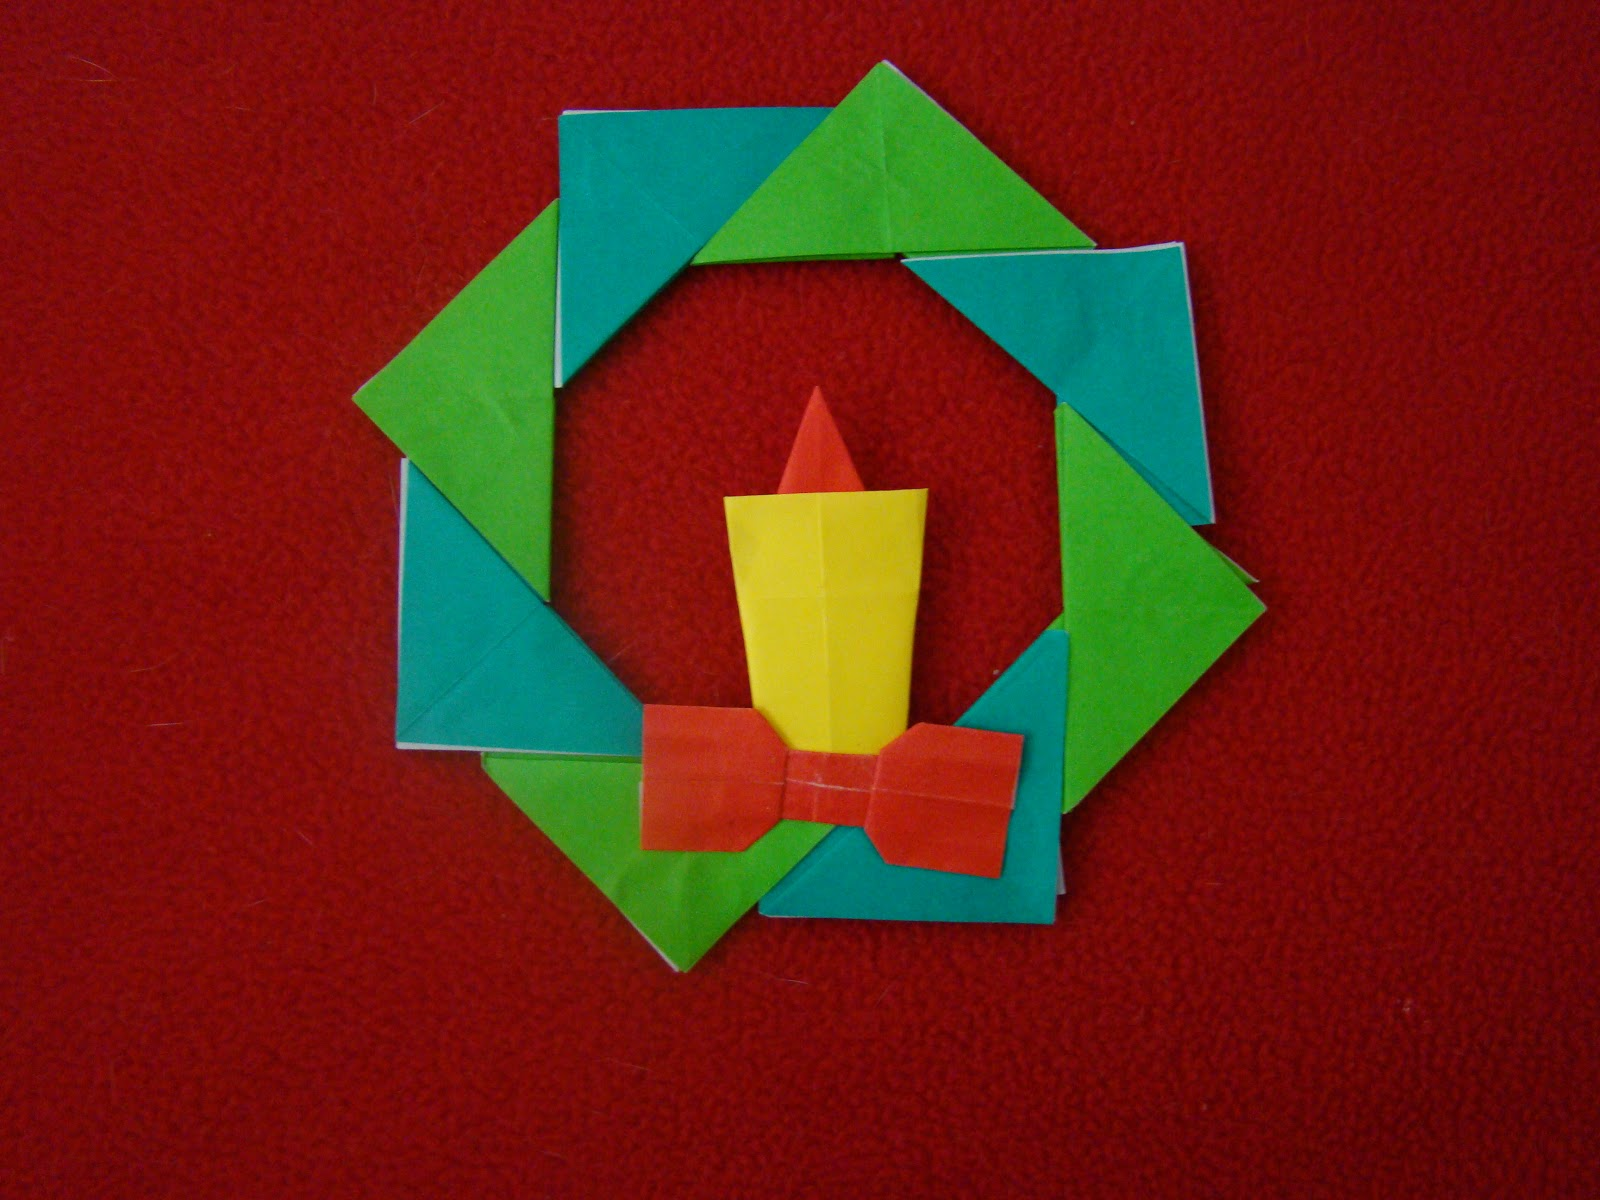 Christmas Origami Diagram Kenmore Dryer Model 110 Maniacs Wreath